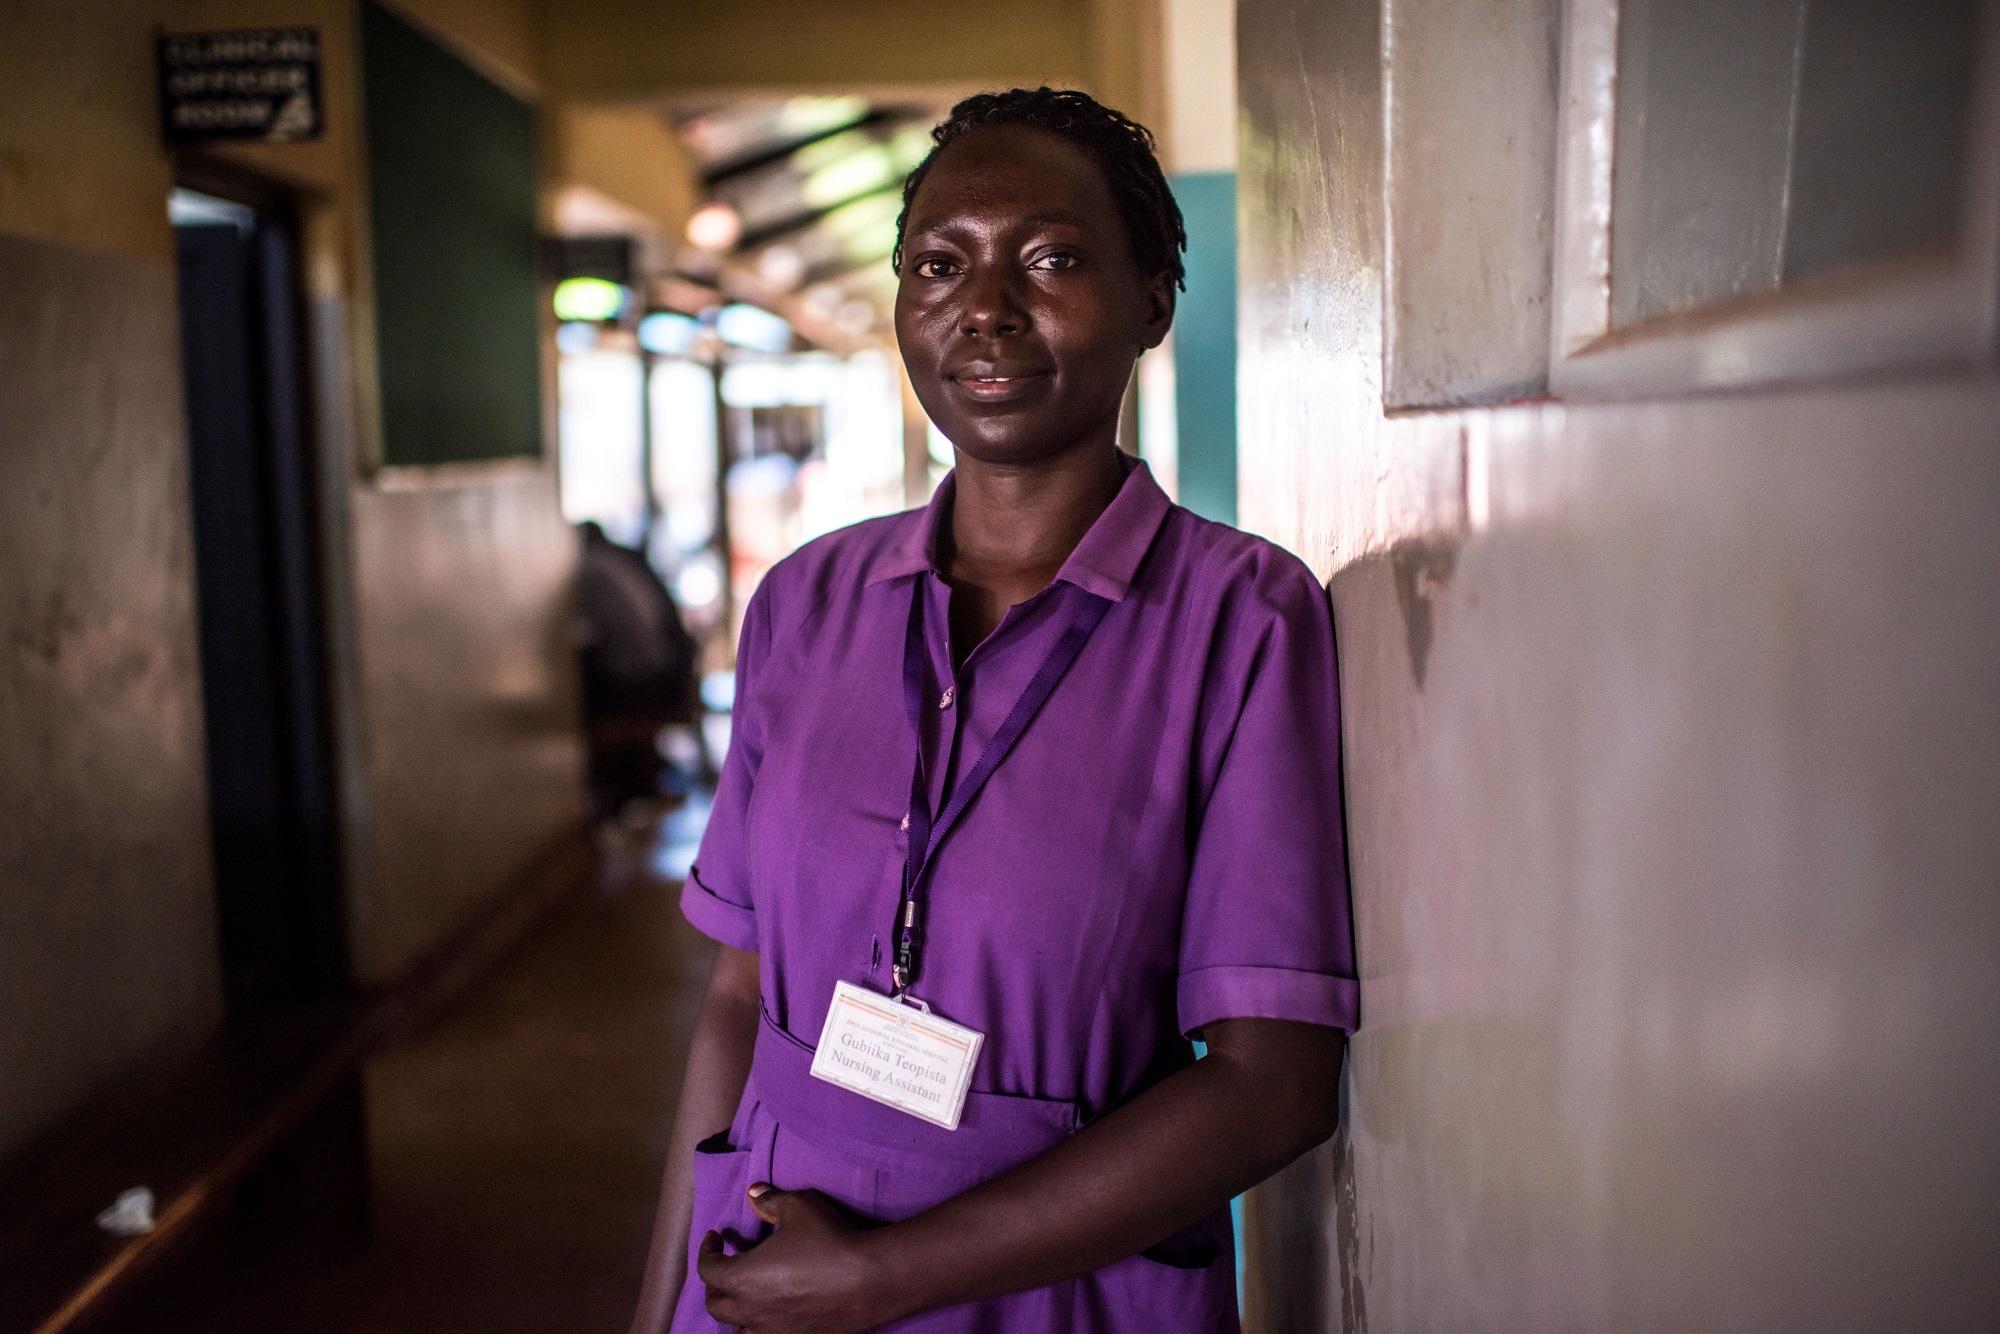 Nursing assistant Gubiika Teopista, photographed in the outpatient department of the Jinja Regional Referral Hospital in Jinja, Uganda.